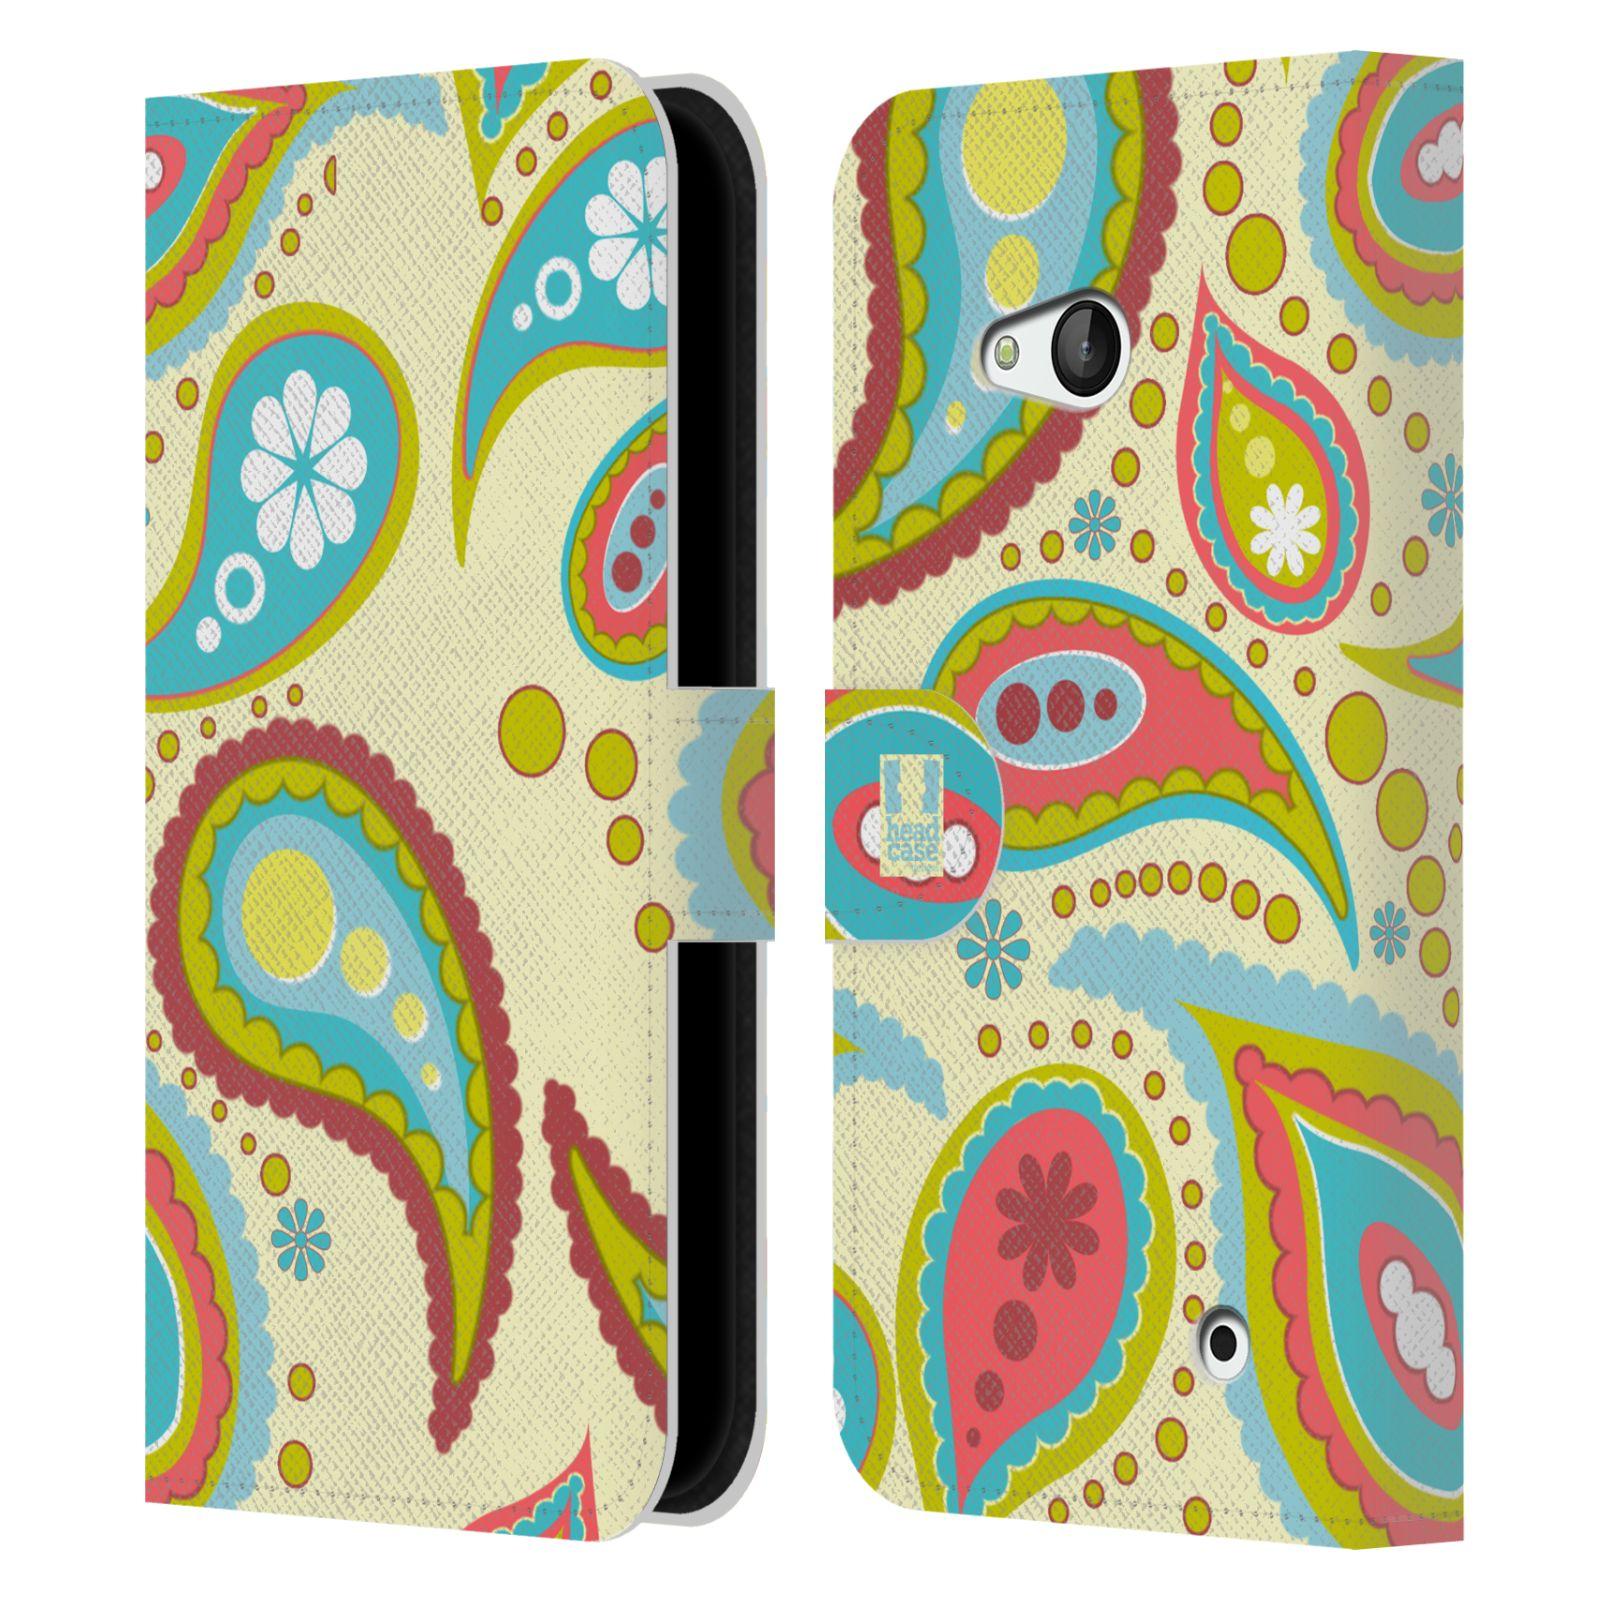 HEAD CASE Flipové pouzdro pro mobil NOKIA / MICROSOFT LUMIA 640 / LUMIA 640 DUAL barevné slzy krémová